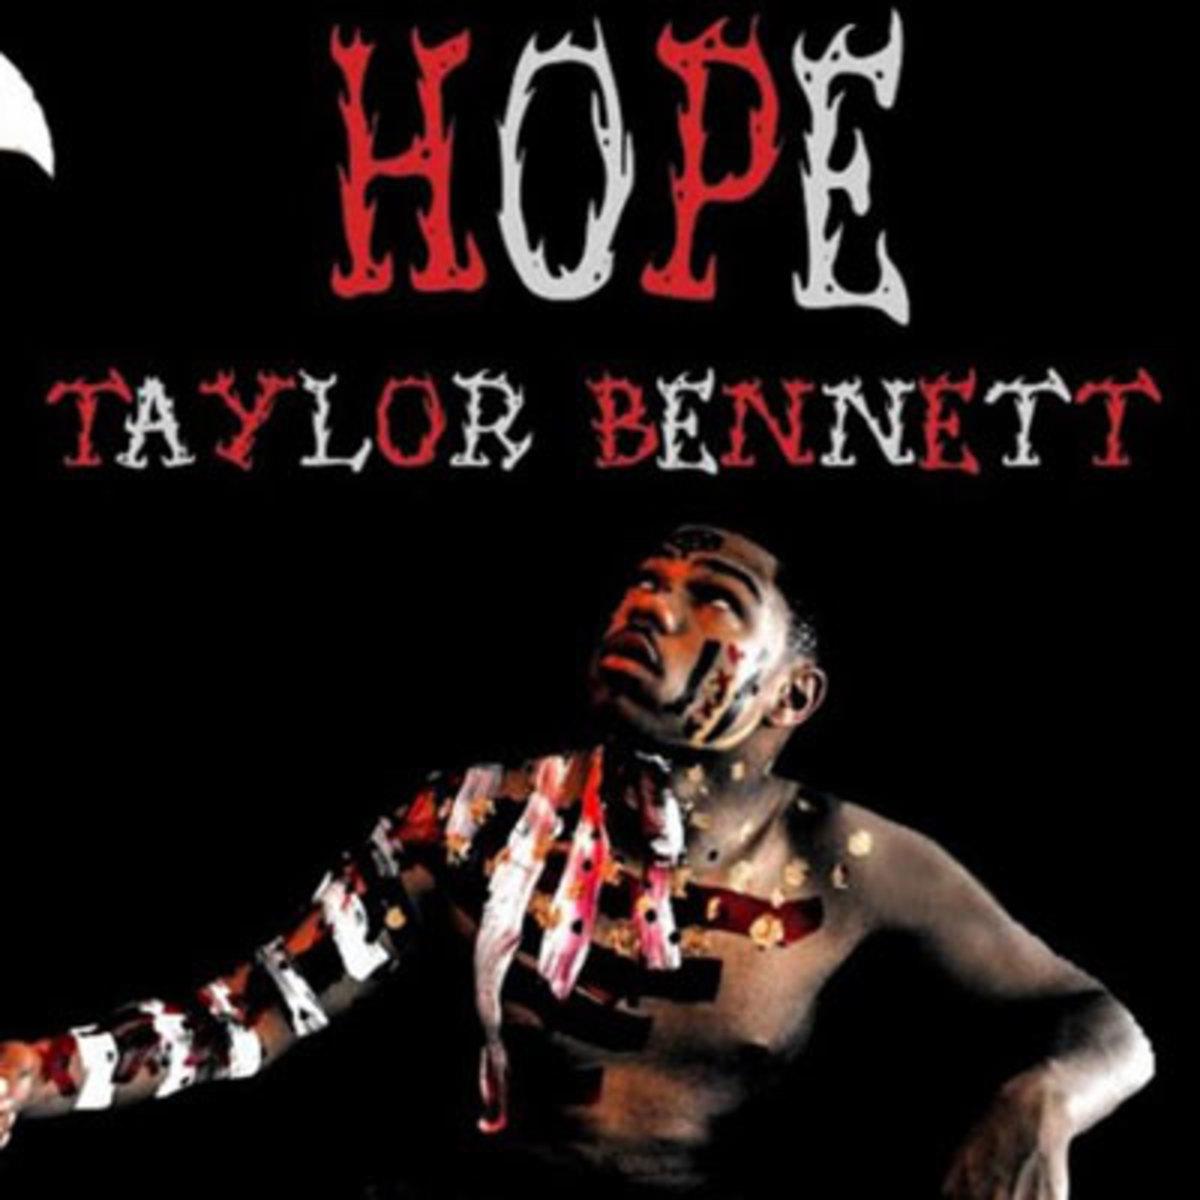 taylorbennett-hope.jpg